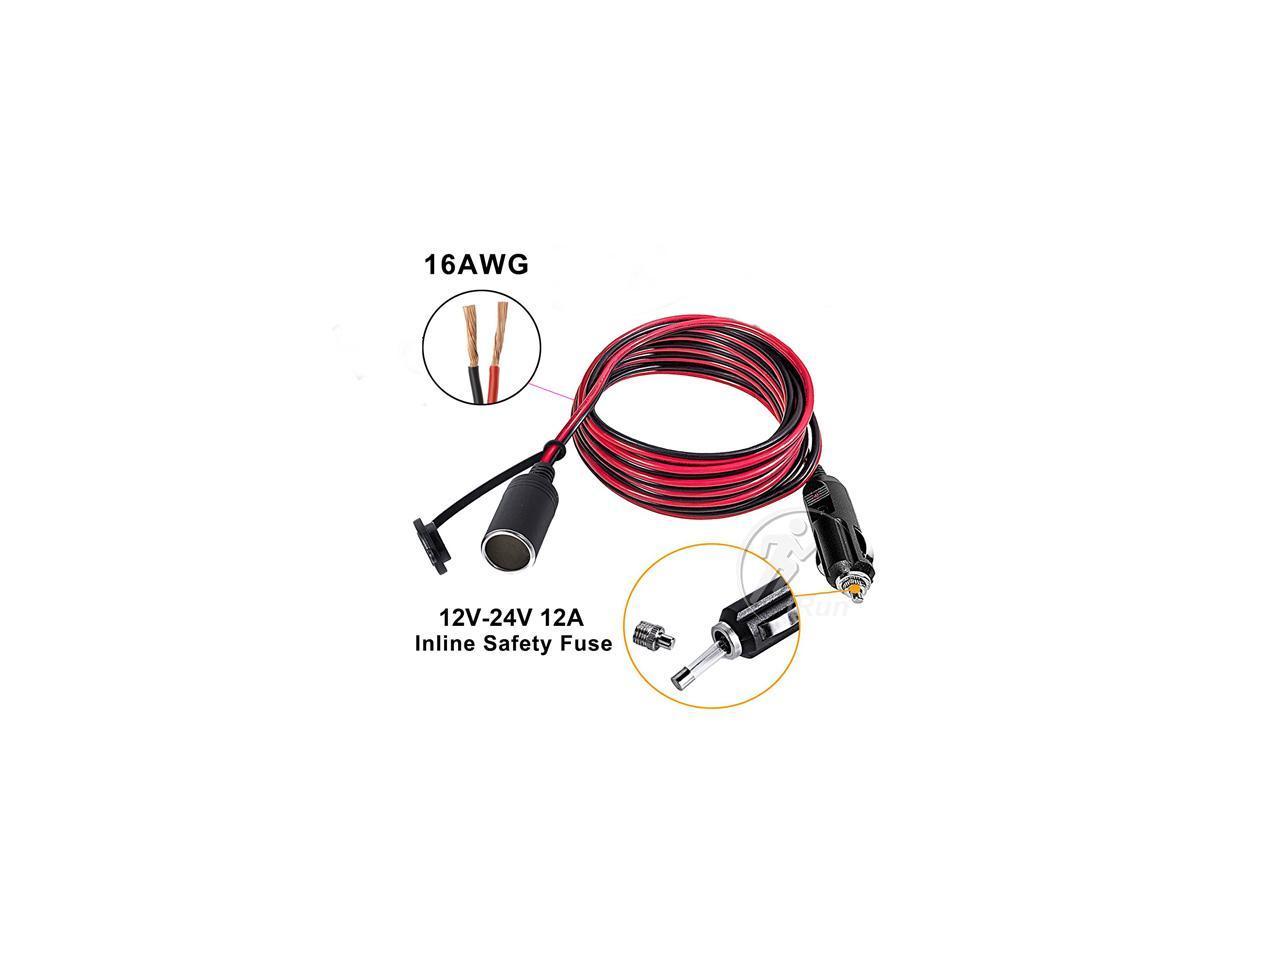 12V 24V 3m Car Cigarette Lighter Power Plug Socket Cord